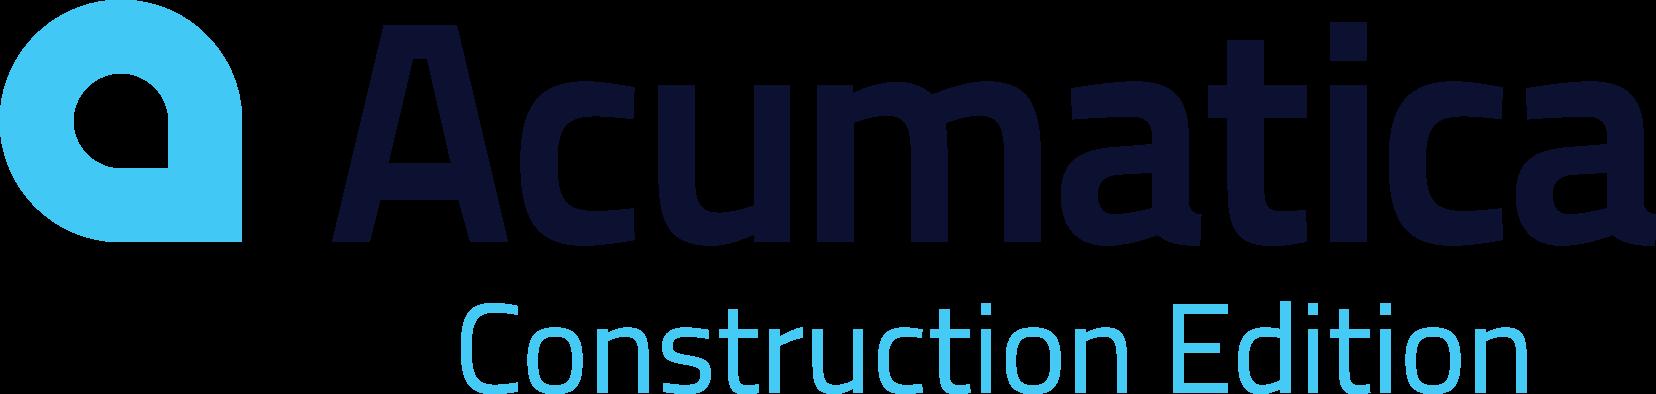 Acumatica-construction-edition